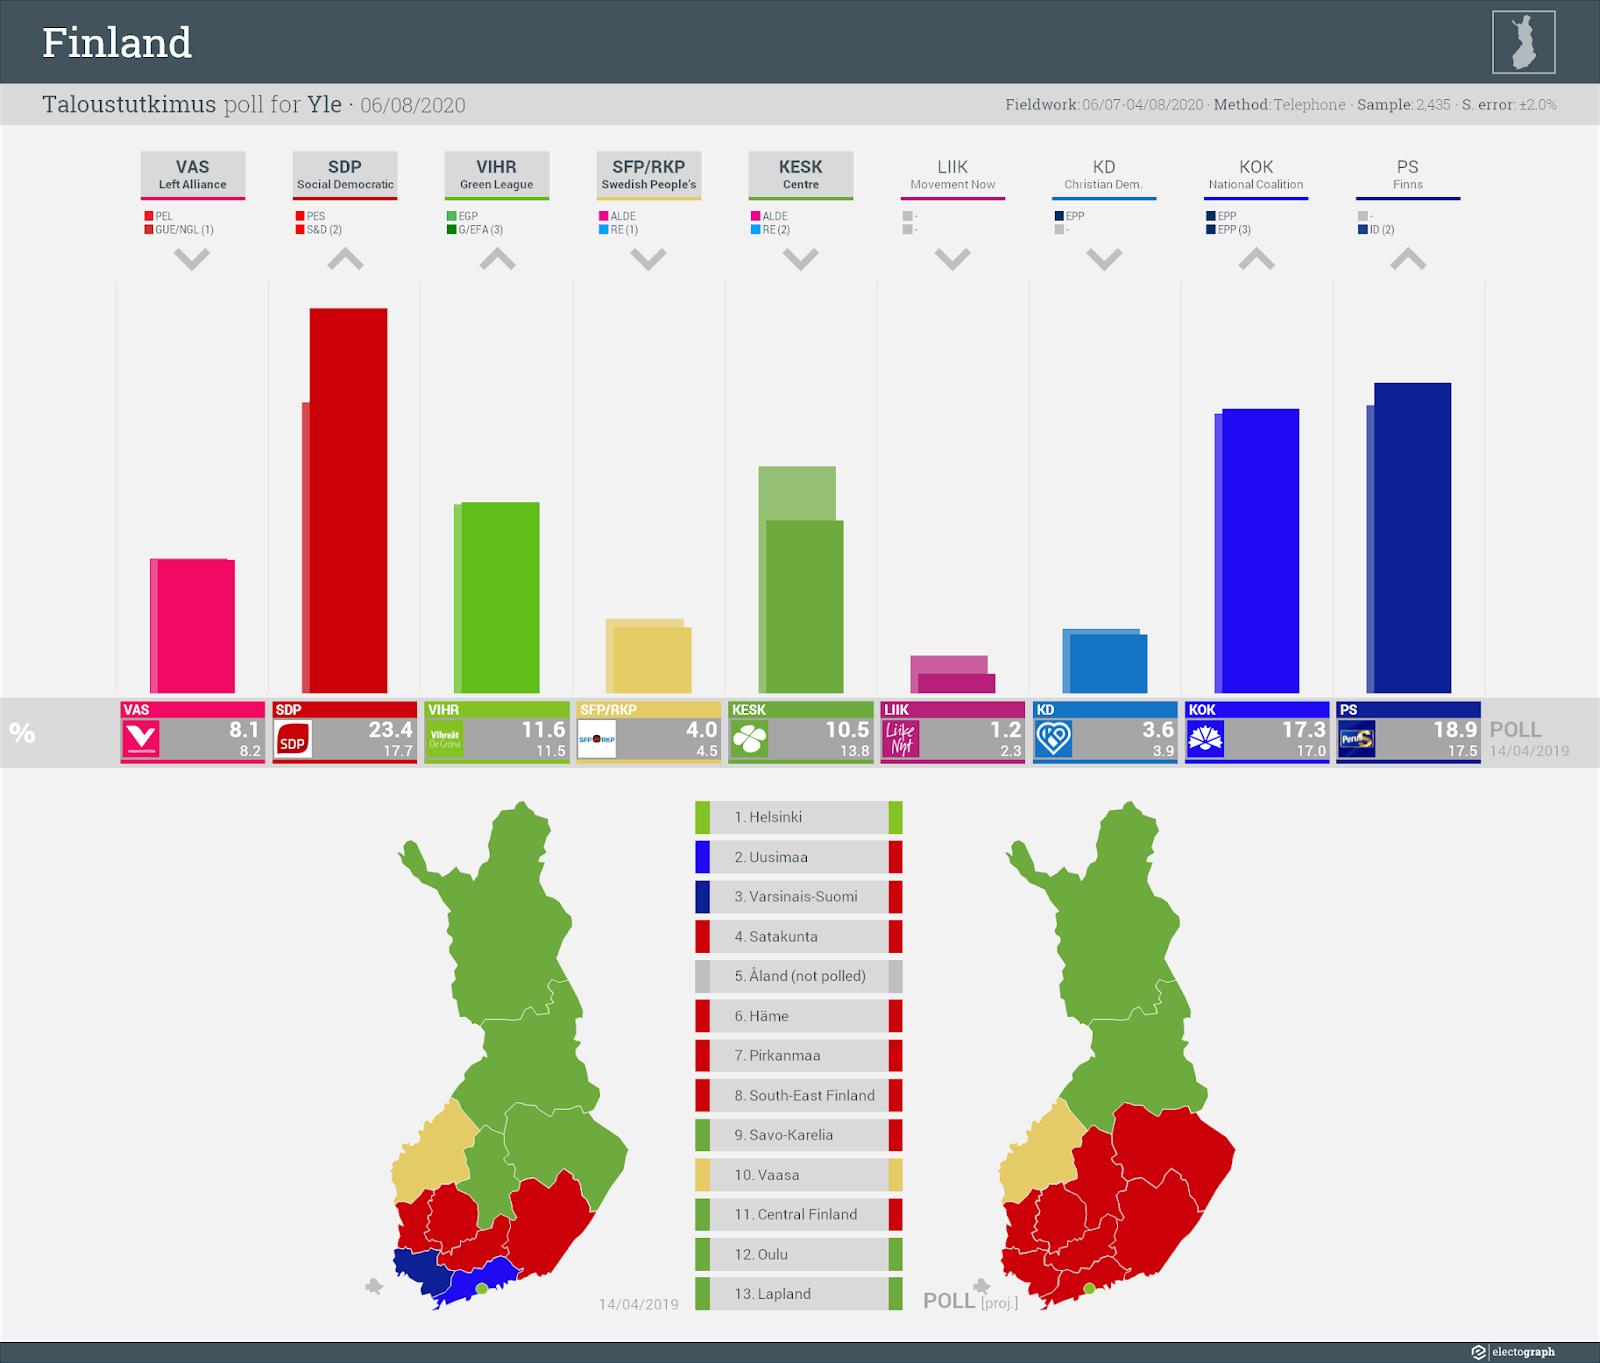 FINLAND: Taloustutkimus poll chart for Yle, 6 August 2020